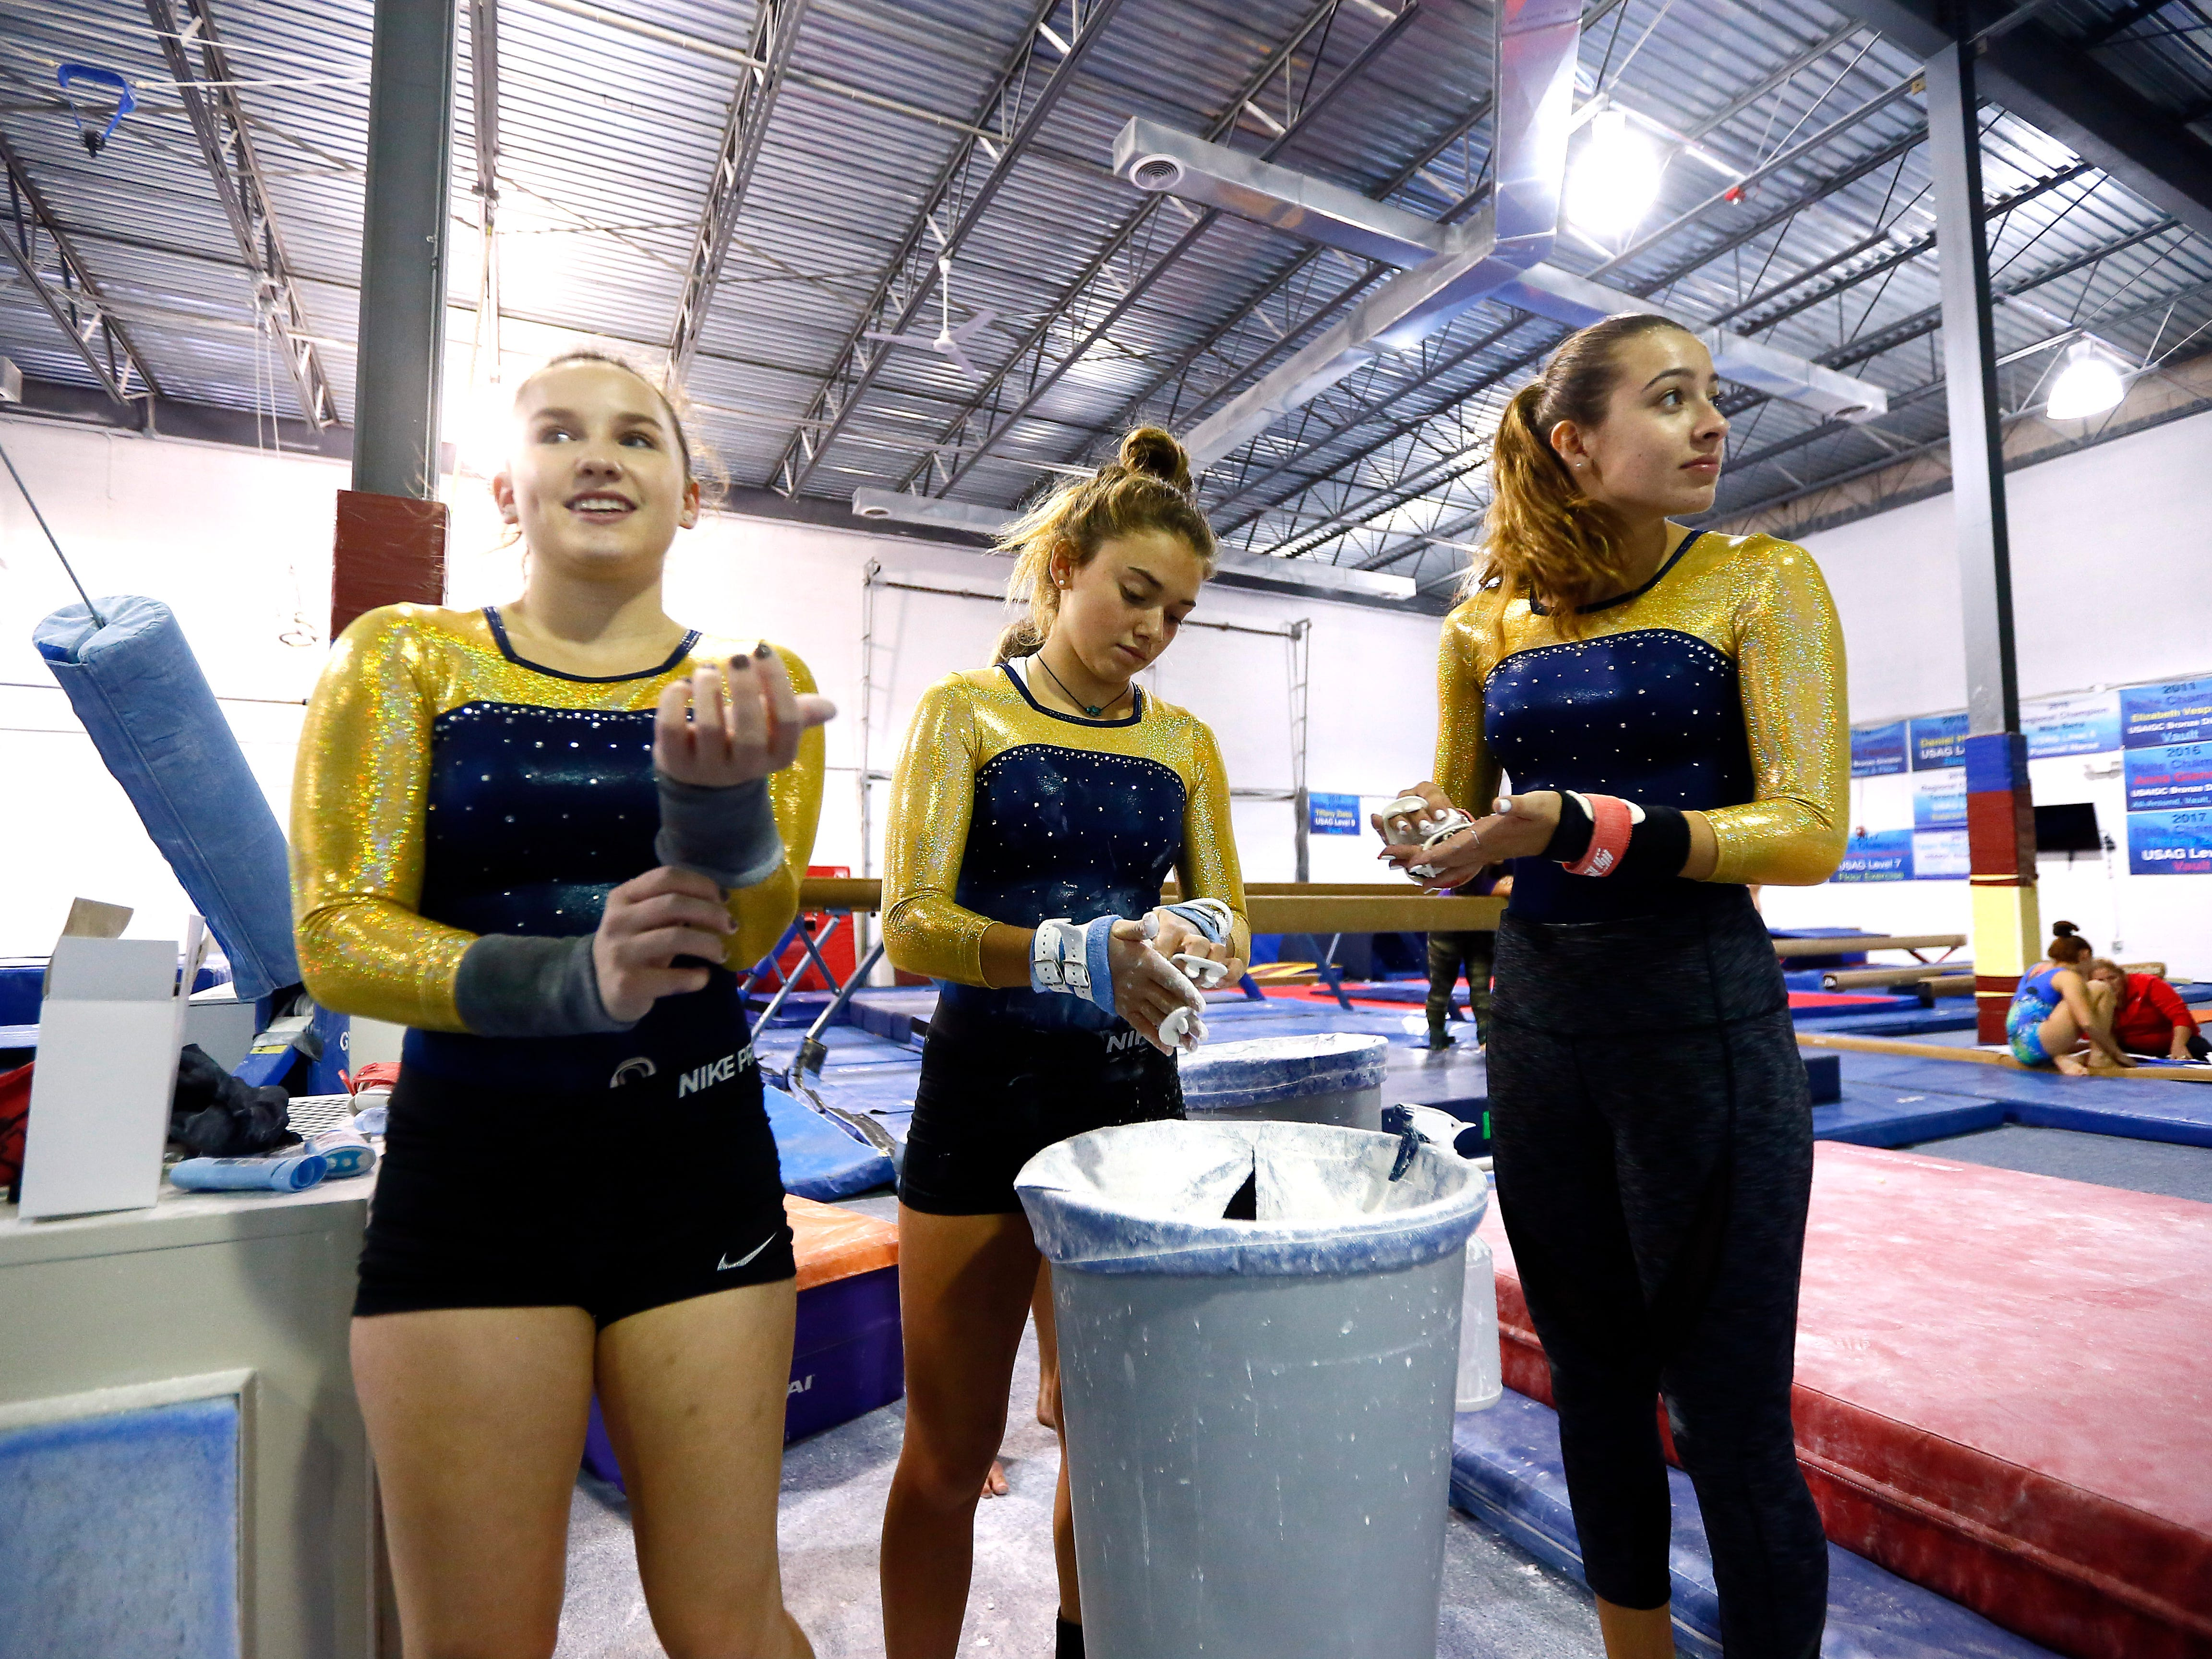 Roxbury High School junior Tiffany Zieba, l, junior  Ashley Miller and senior Nicole Arevalo chalk up during gymnastics practice at Northern Elite Gymnastics & Cheer in Flanders. Roxbury has just launched a girls gymnastics team.  September 25, 2018, Flanders, NJ